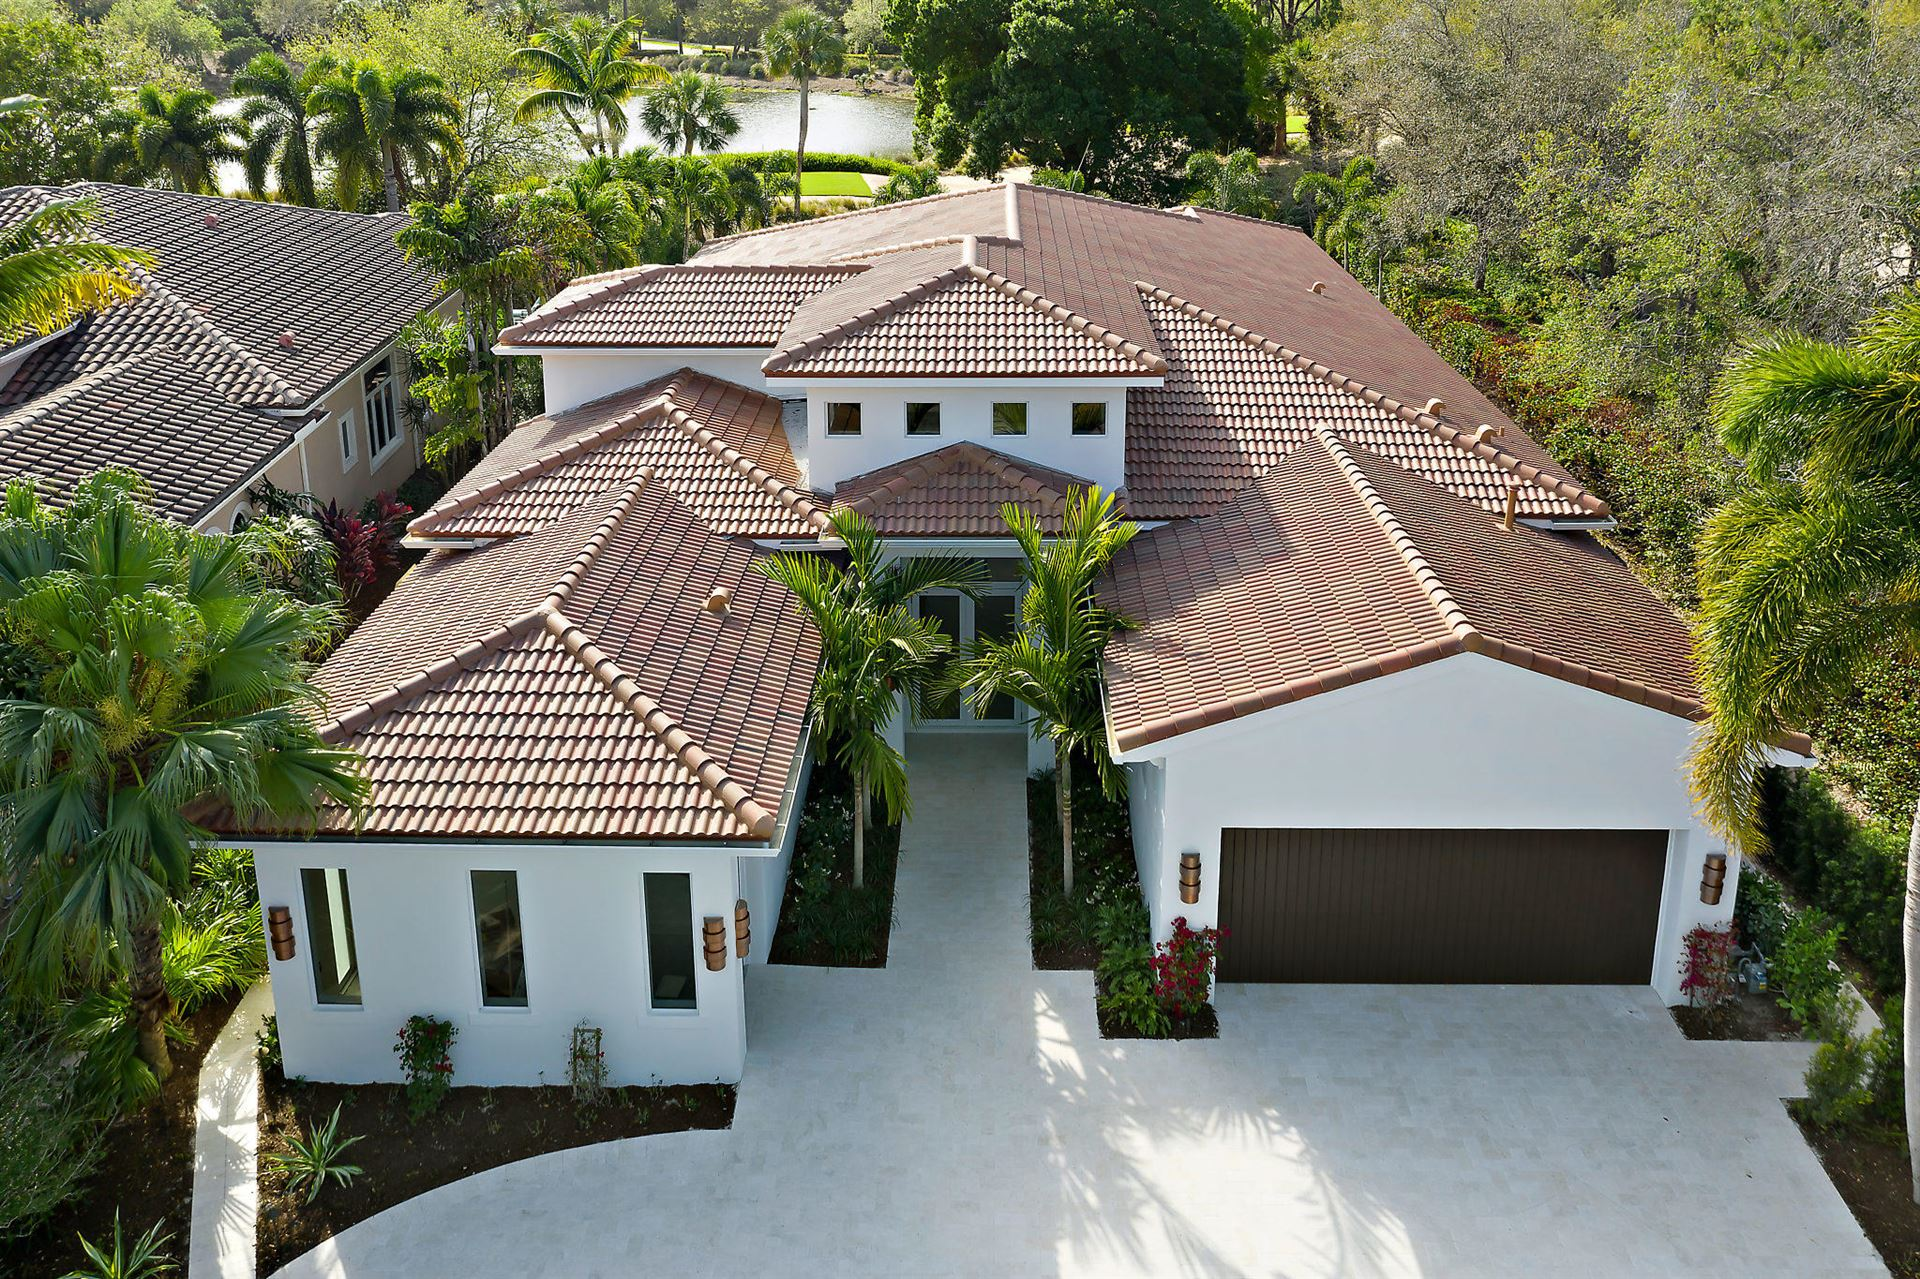 11135 Green Bayberry Drive, Palm Beach Gardens, FL 33418 - #: RX-10608337